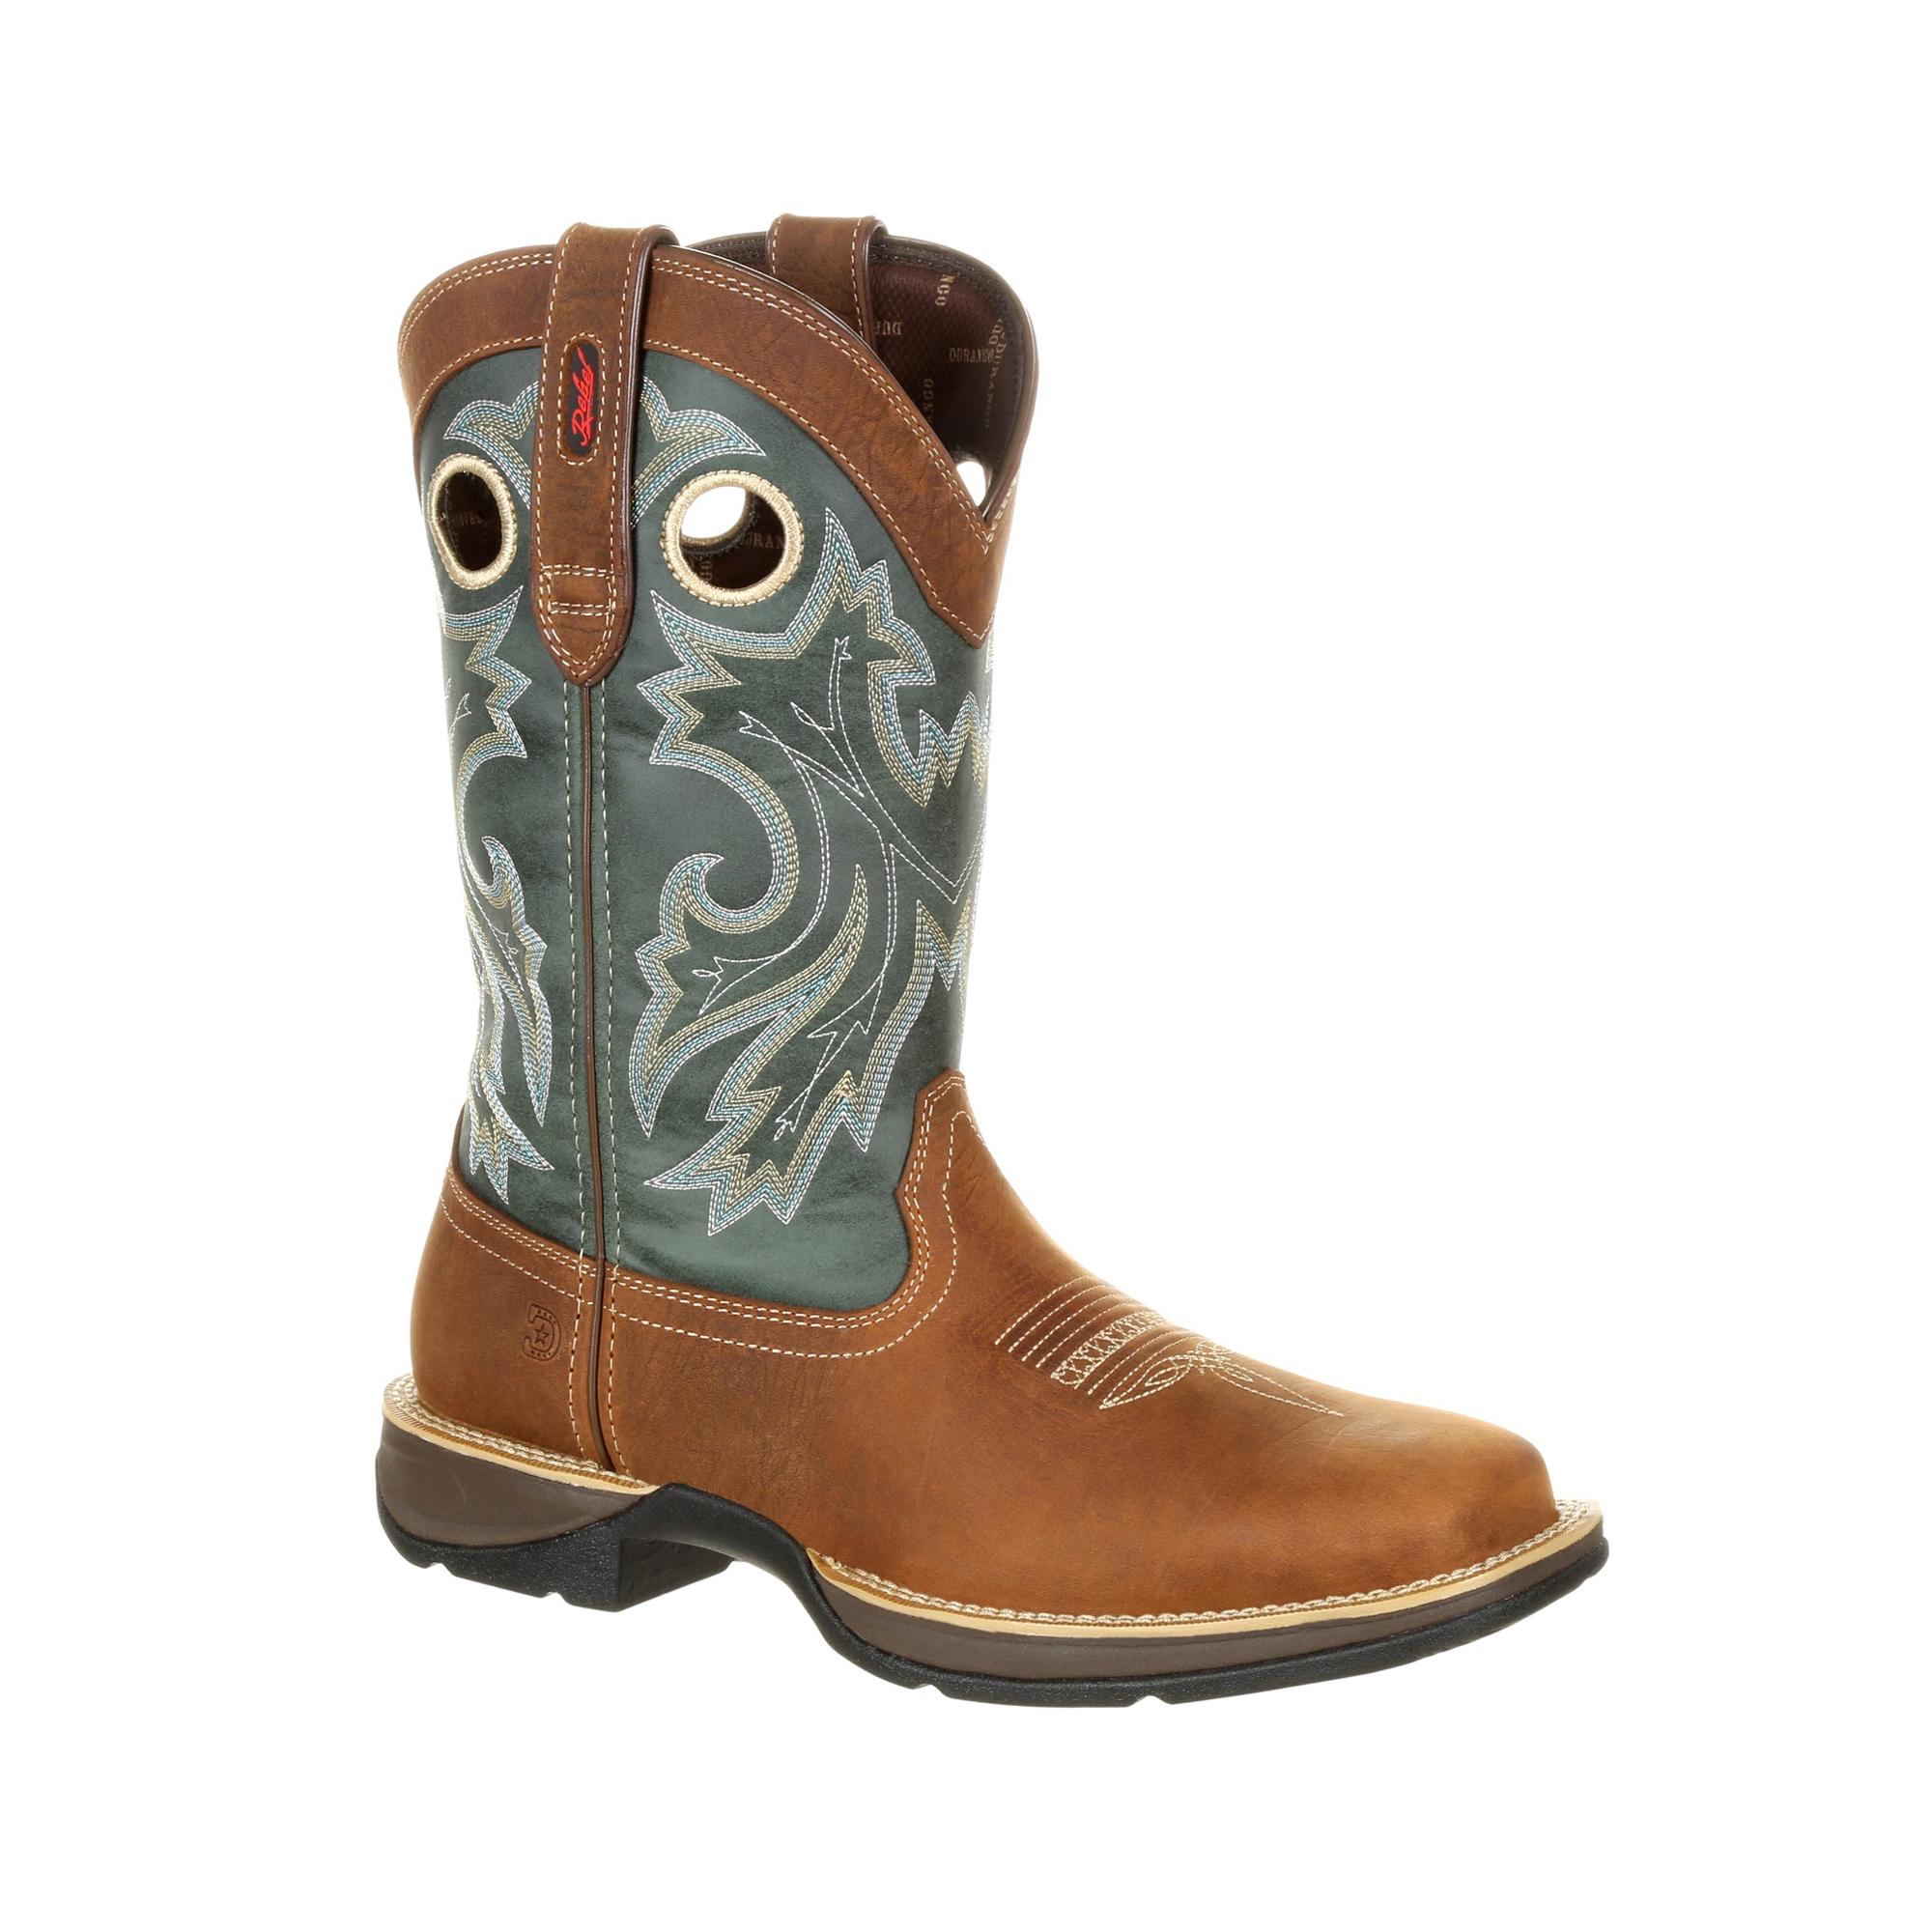 Durango Mens Clover/Saddle Leather Rebel PullOn Cowboy Boots